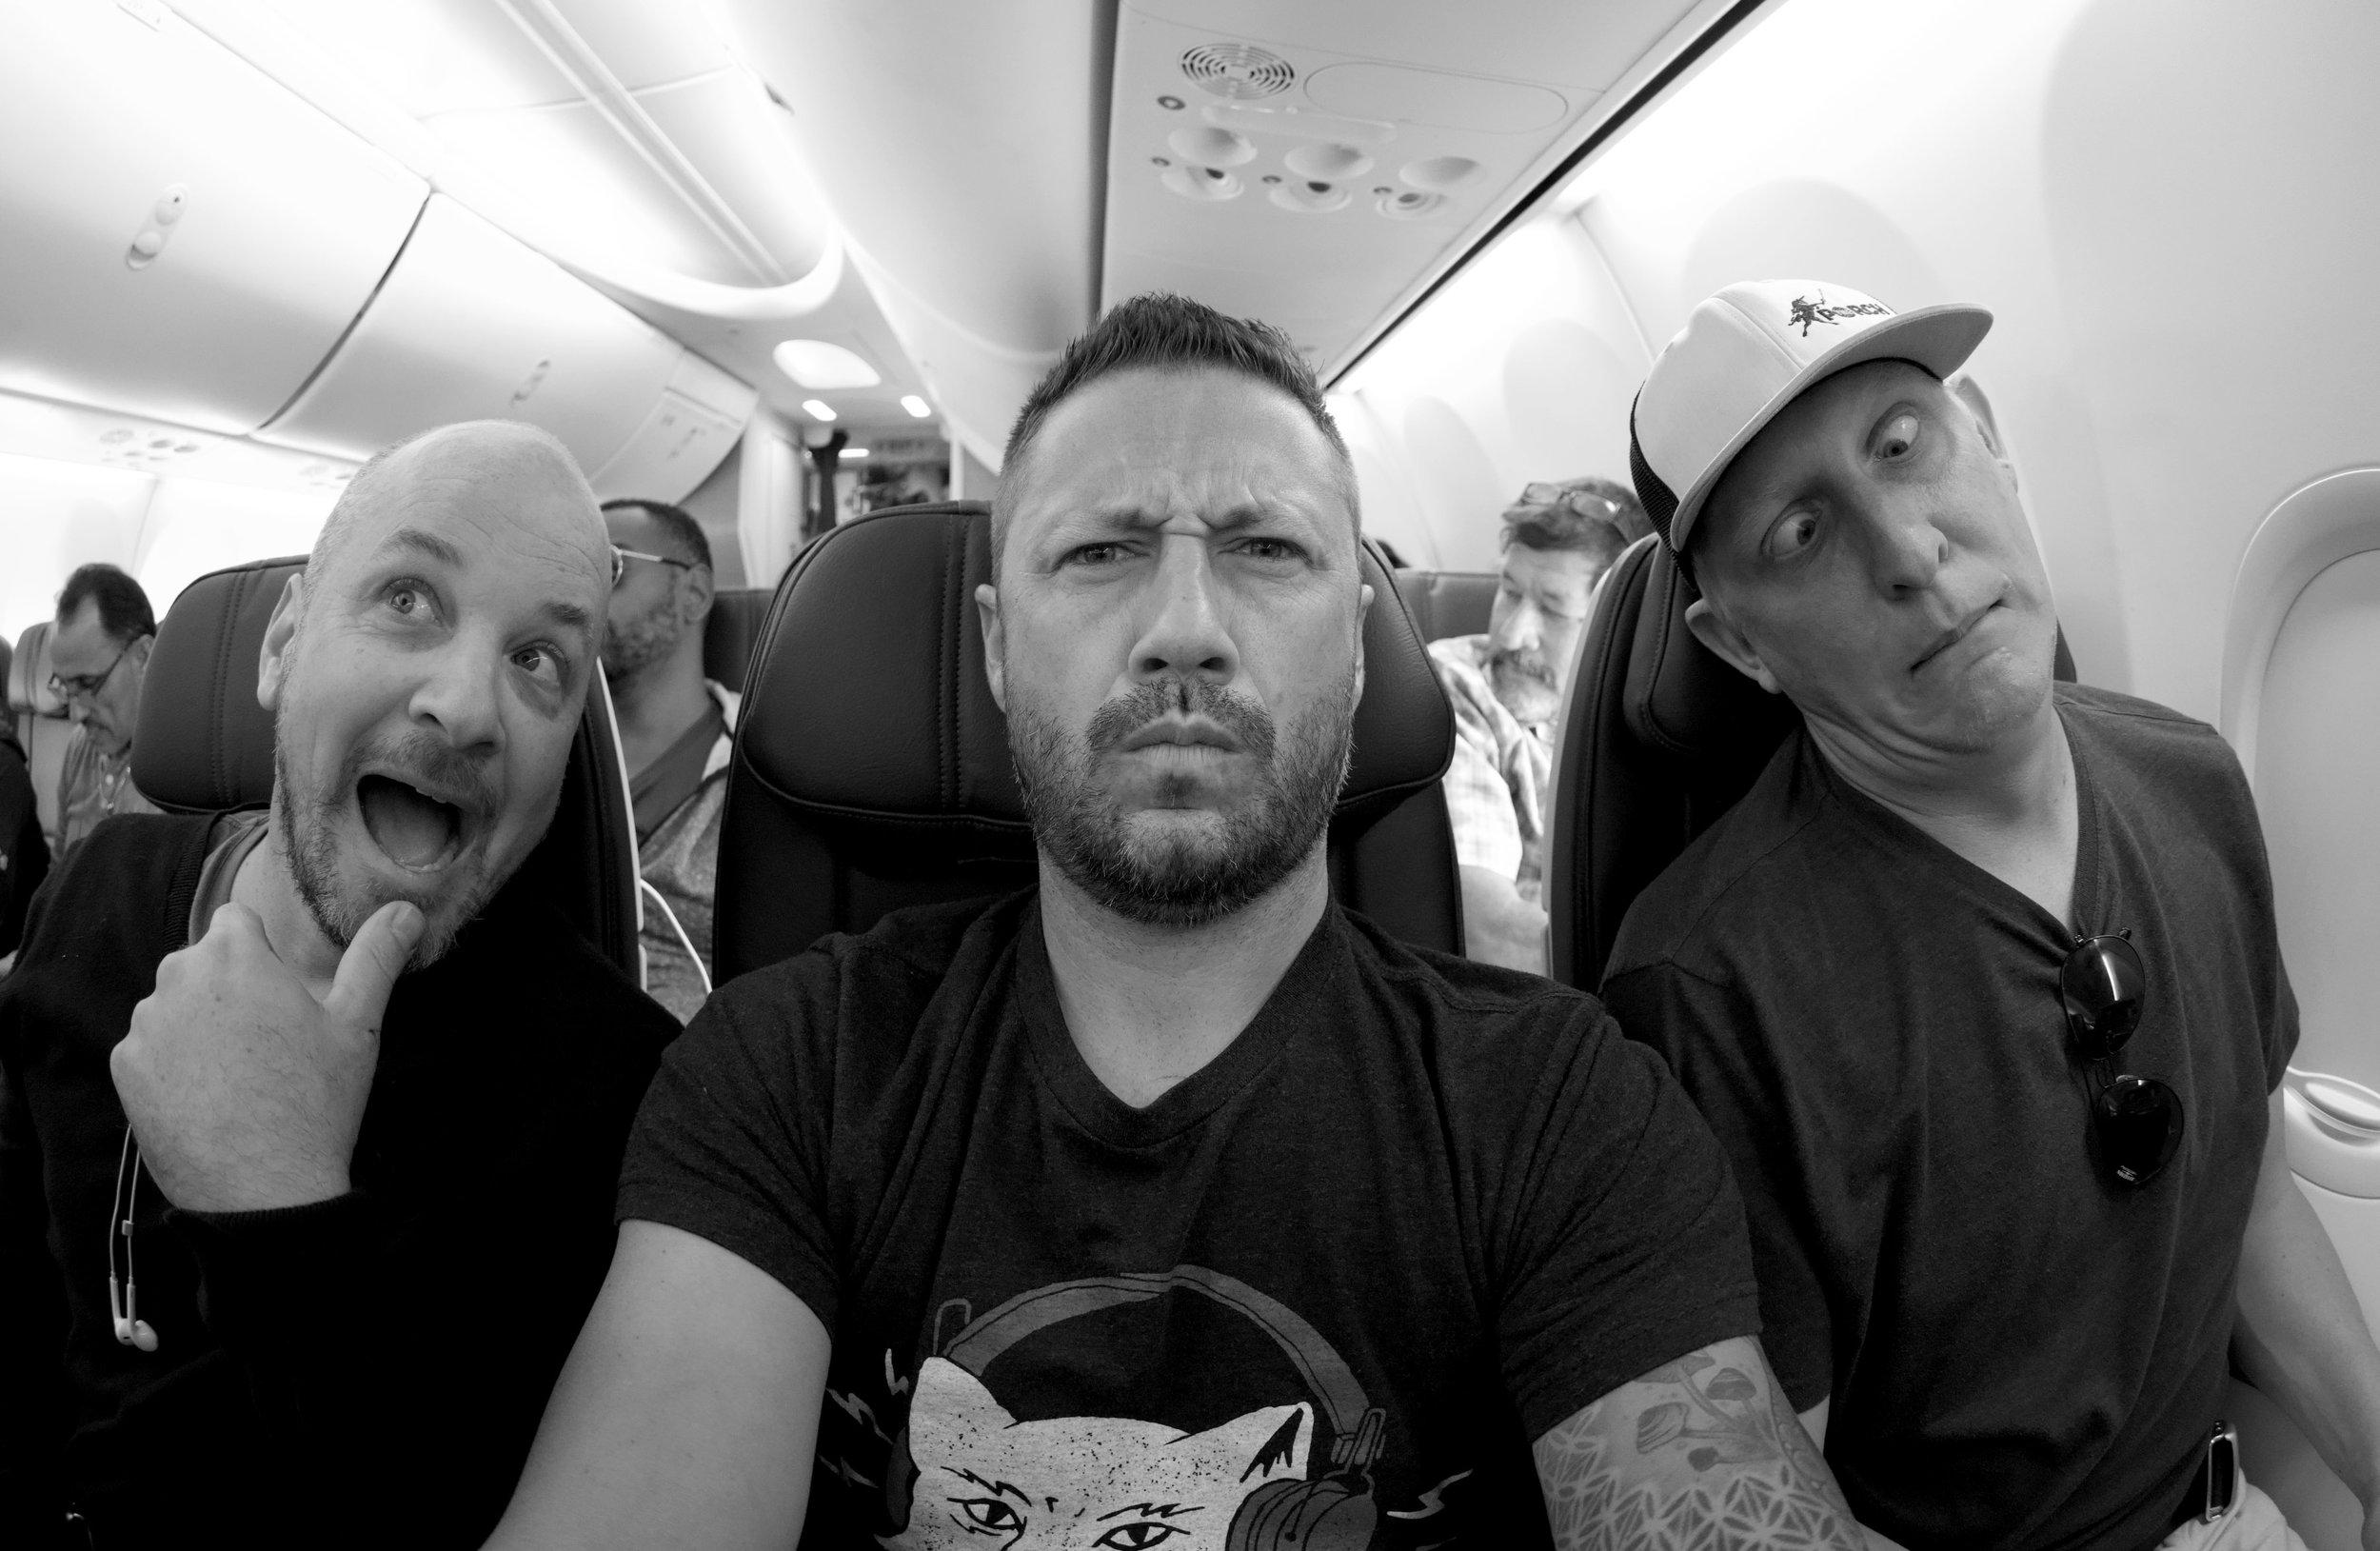 Marky Nick Chris on Plane bnw.jpg